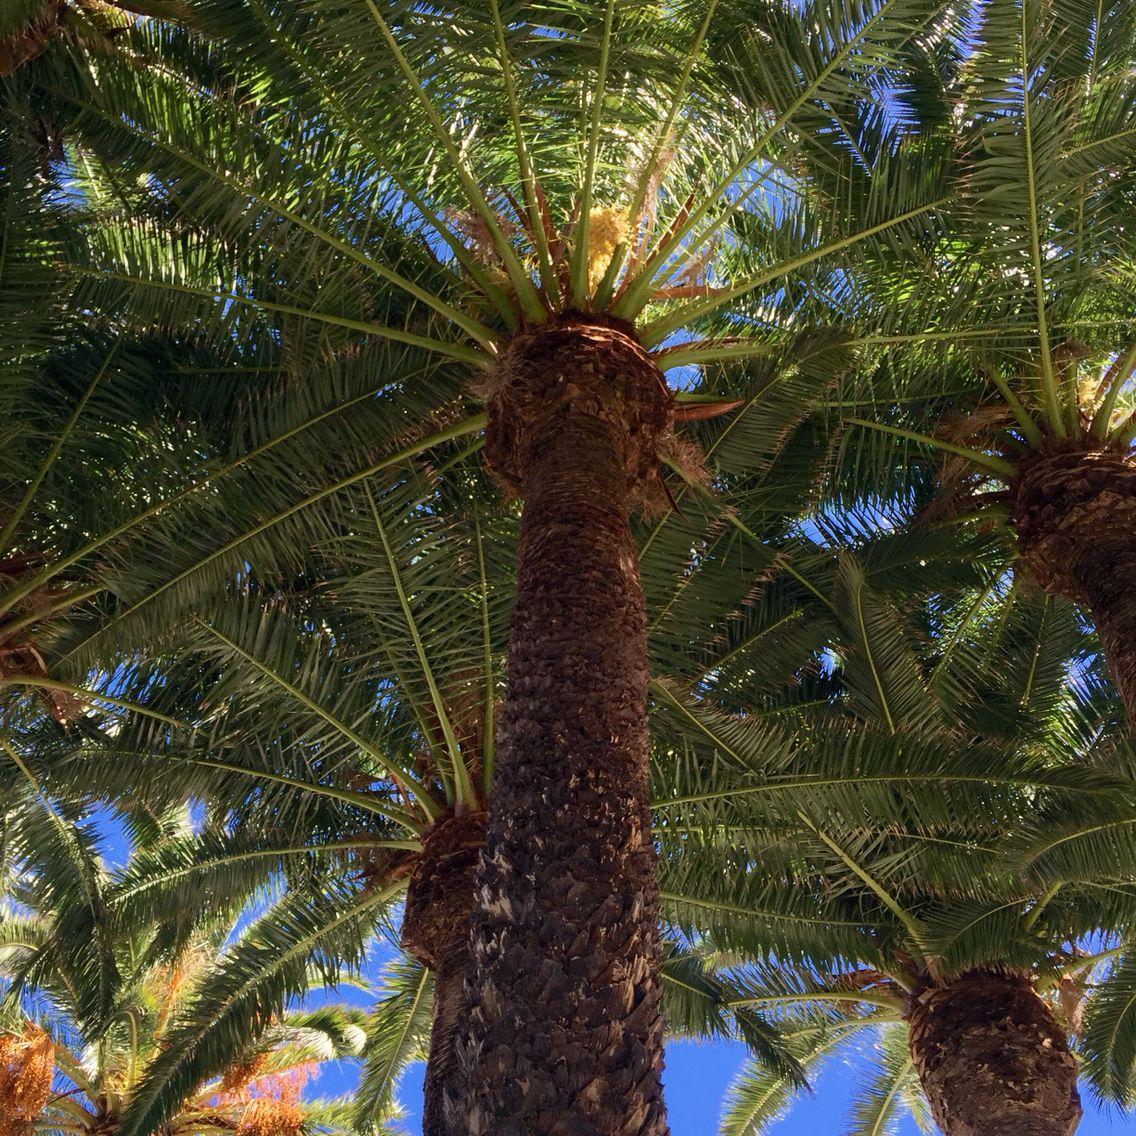 Beautiful canopy of palms